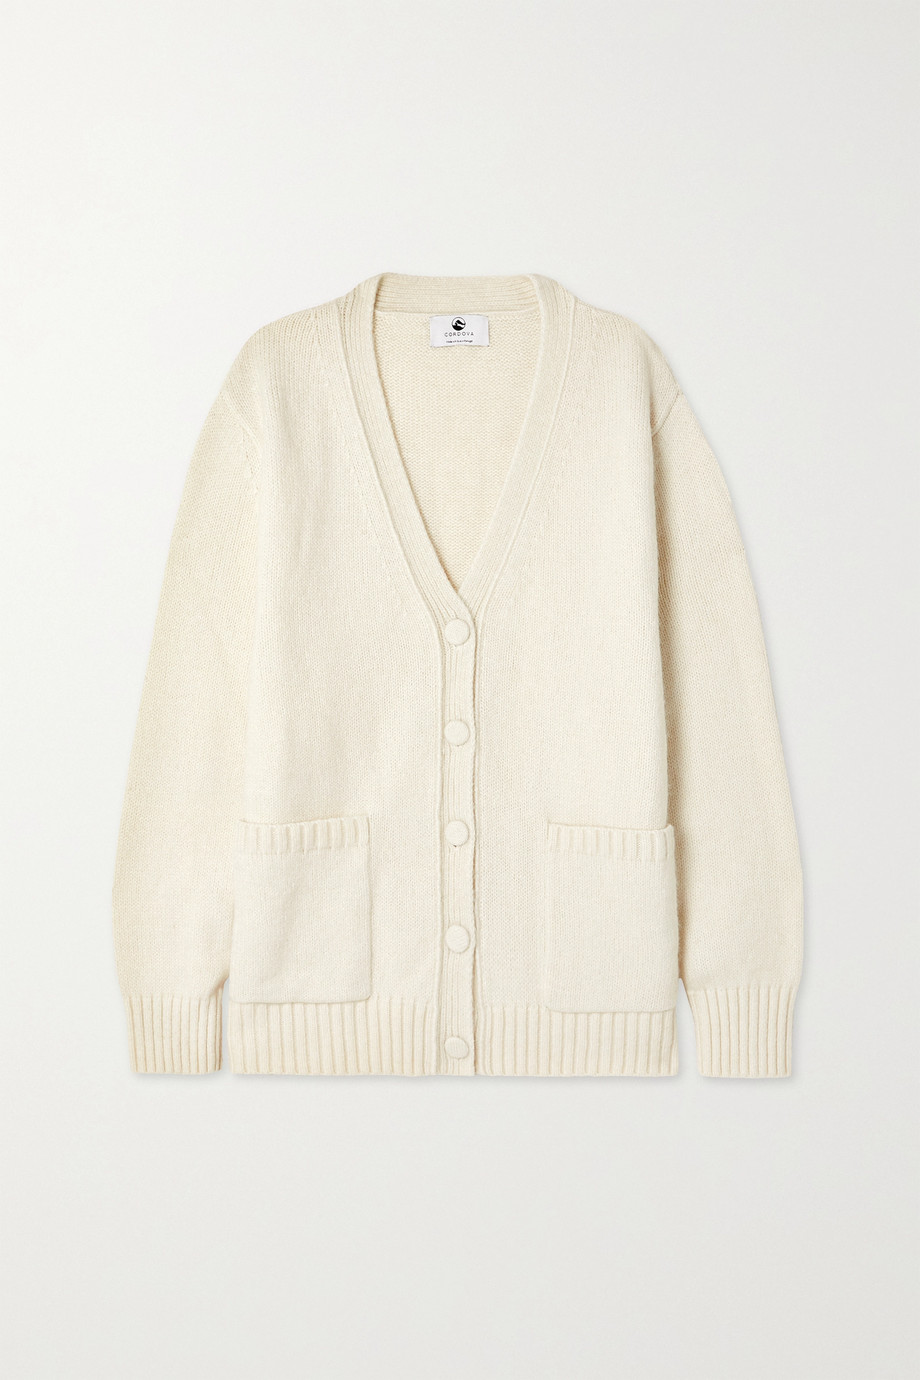 Cordova Oversized knitted cardigan